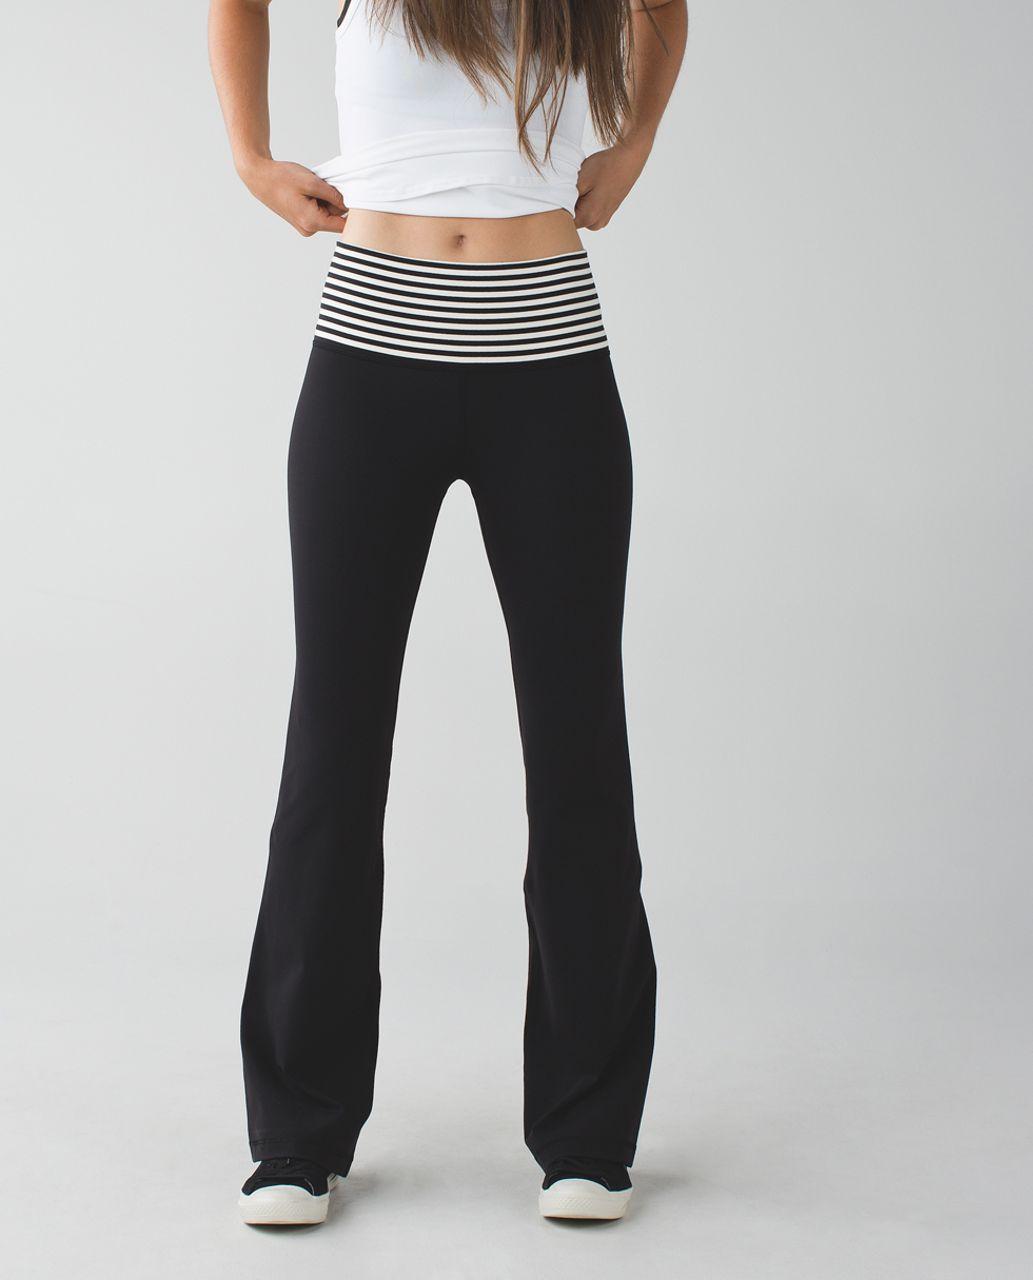 Lululemon Groove Pant (Tall) - Black / Narrow Bold Stripe Black Angel Wing